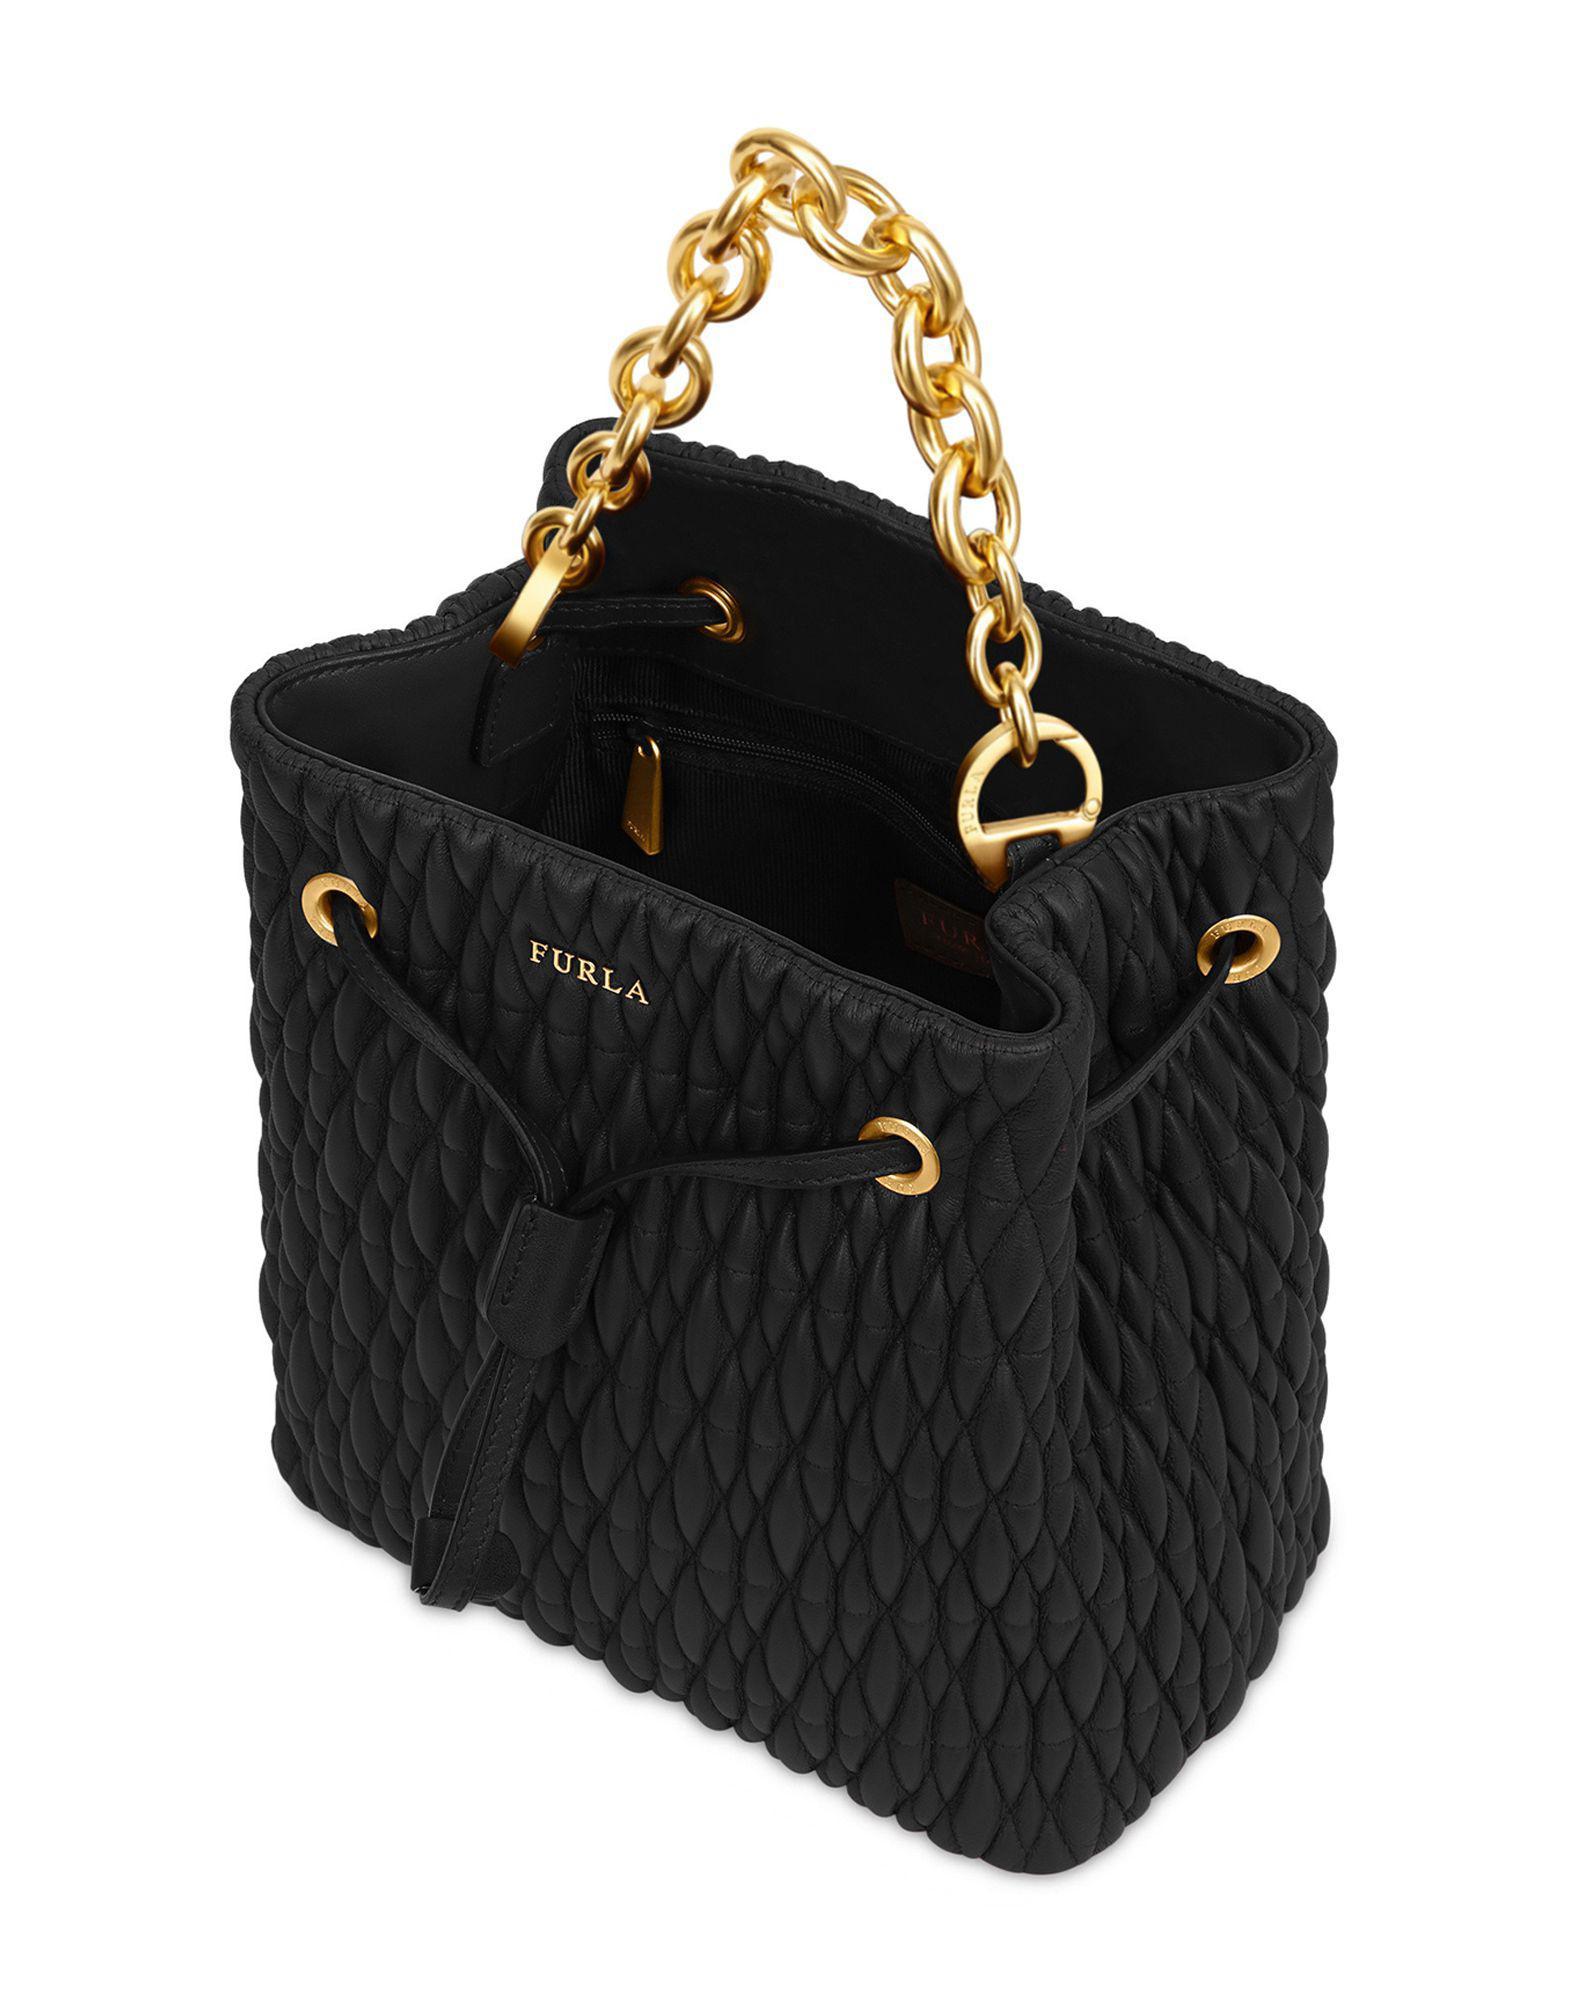 42134309c596 Lyst - Furla Handbag in Black - Save 38%